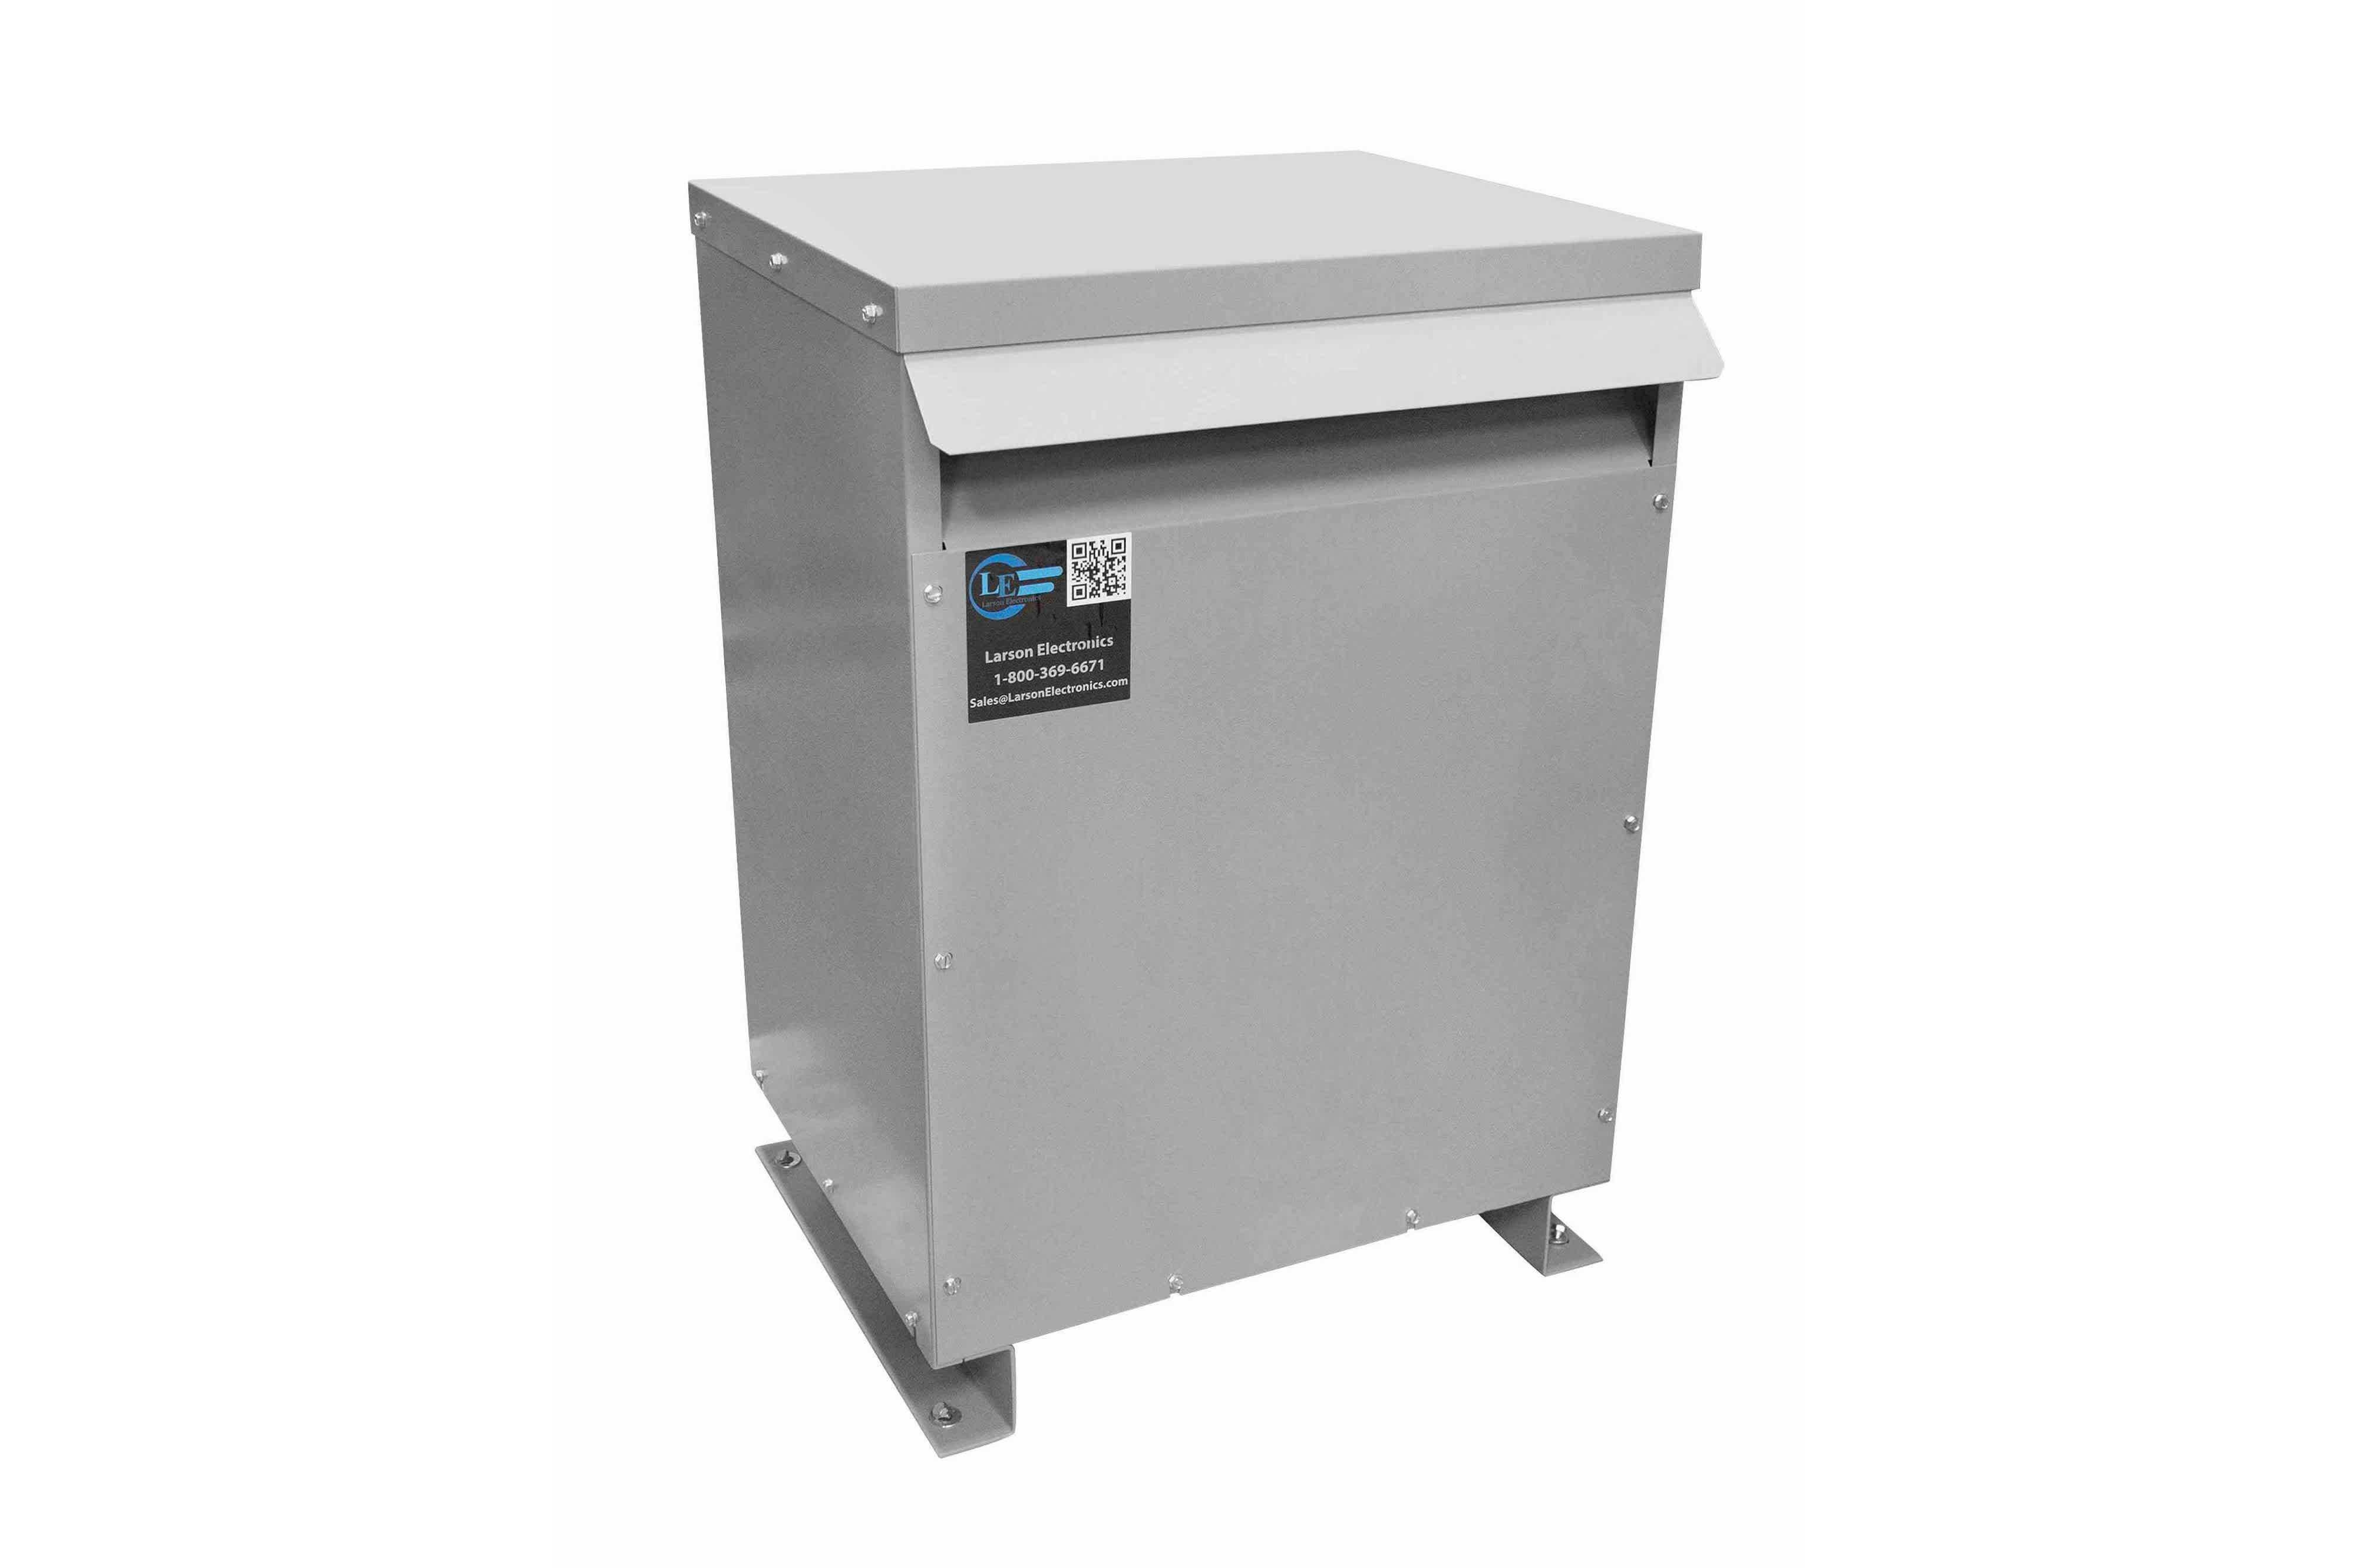 27 kVA 3PH Isolation Transformer, 575V Wye Primary, 380Y/220 Wye-N Secondary, N3R, Ventilated, 60 Hz